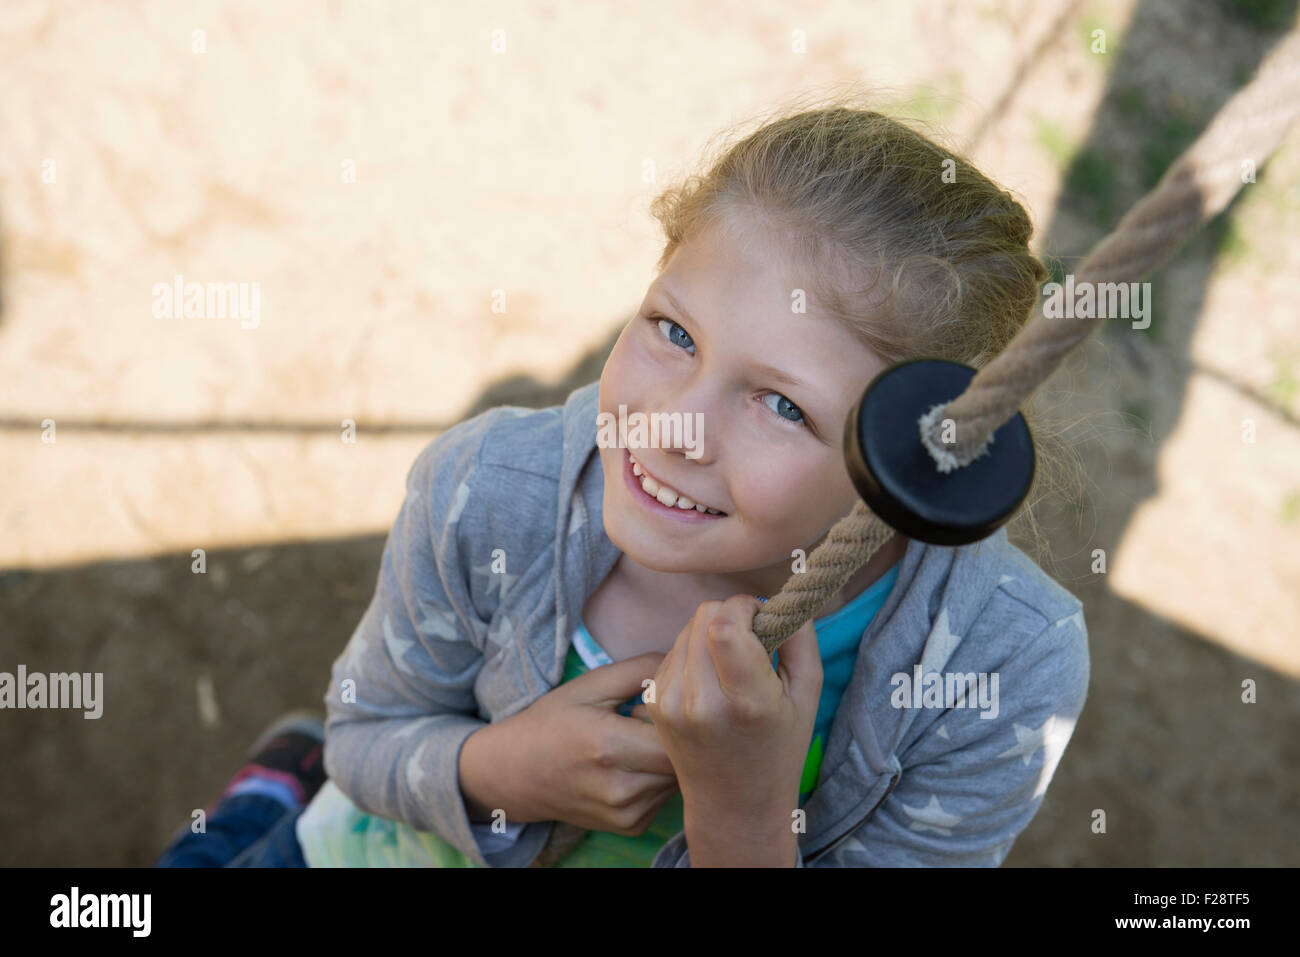 Girl climbing on rope in playground, Munich, Bavaria, Germany - Stock Image